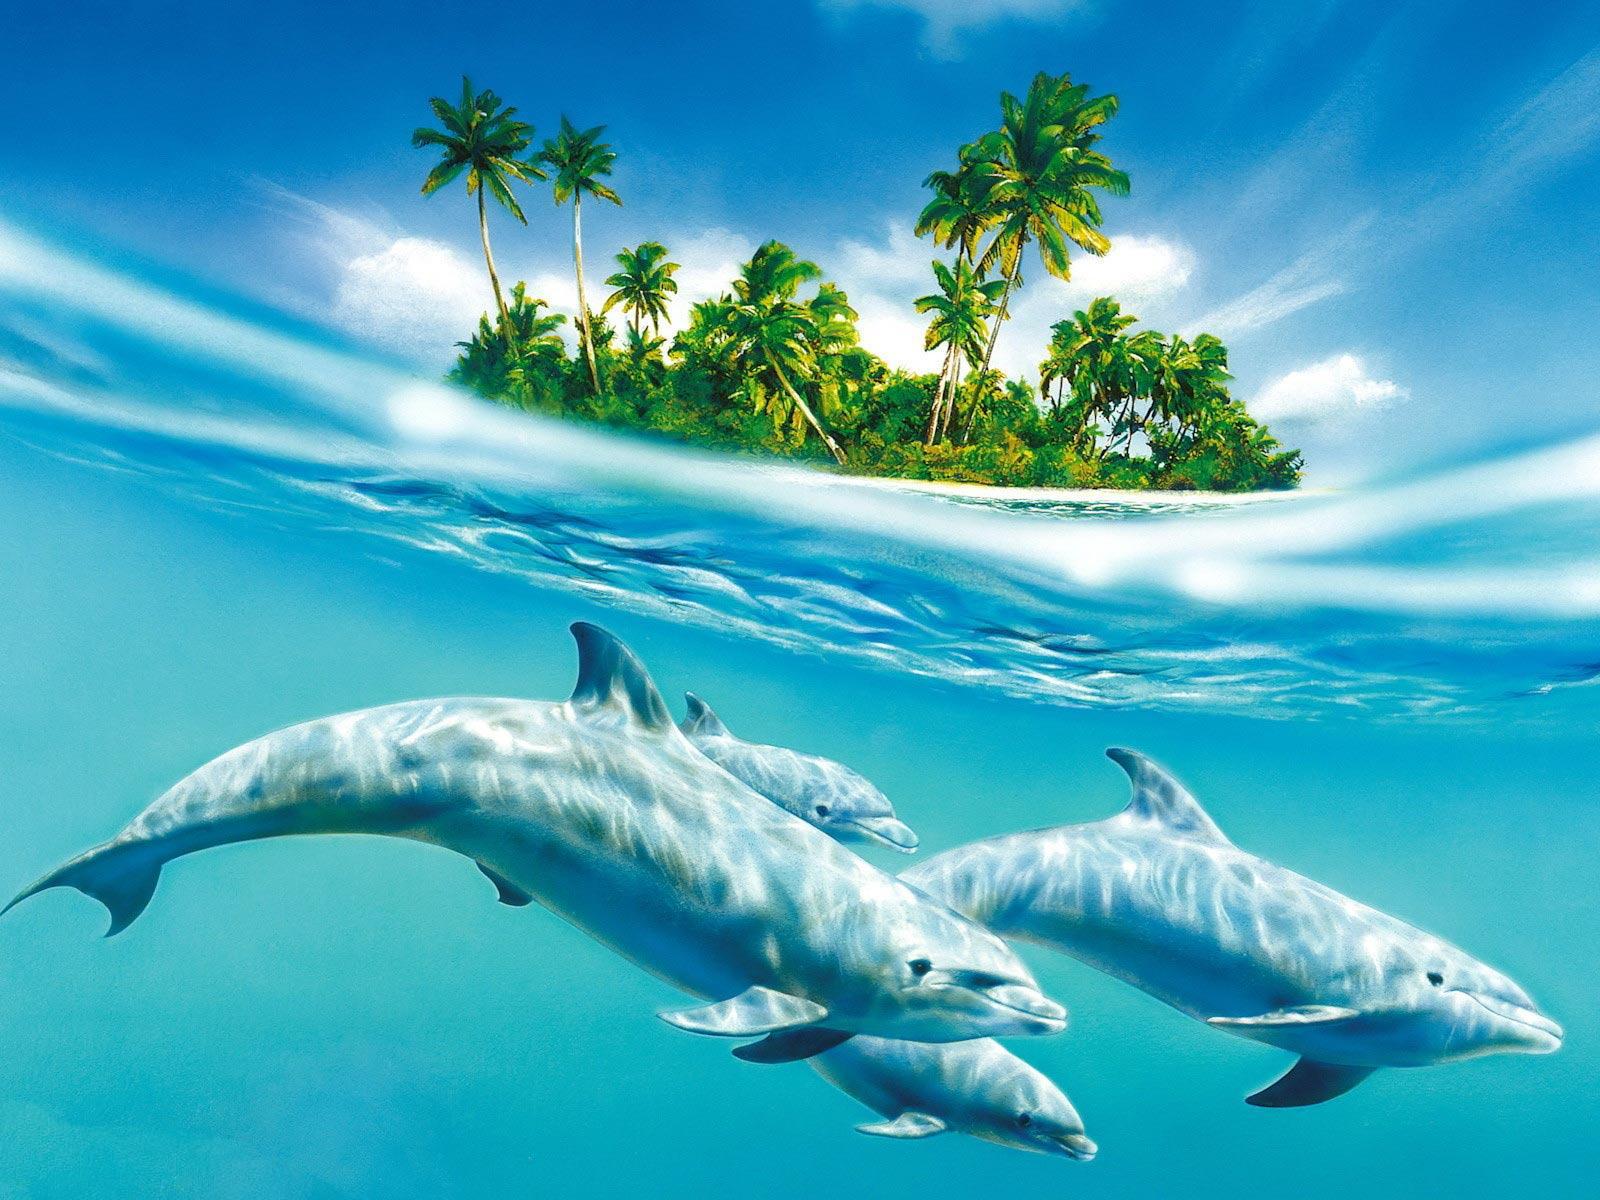 The best top desktop dolphin wallpapers hd dolphins wallpaper 10jpg 1600x1200